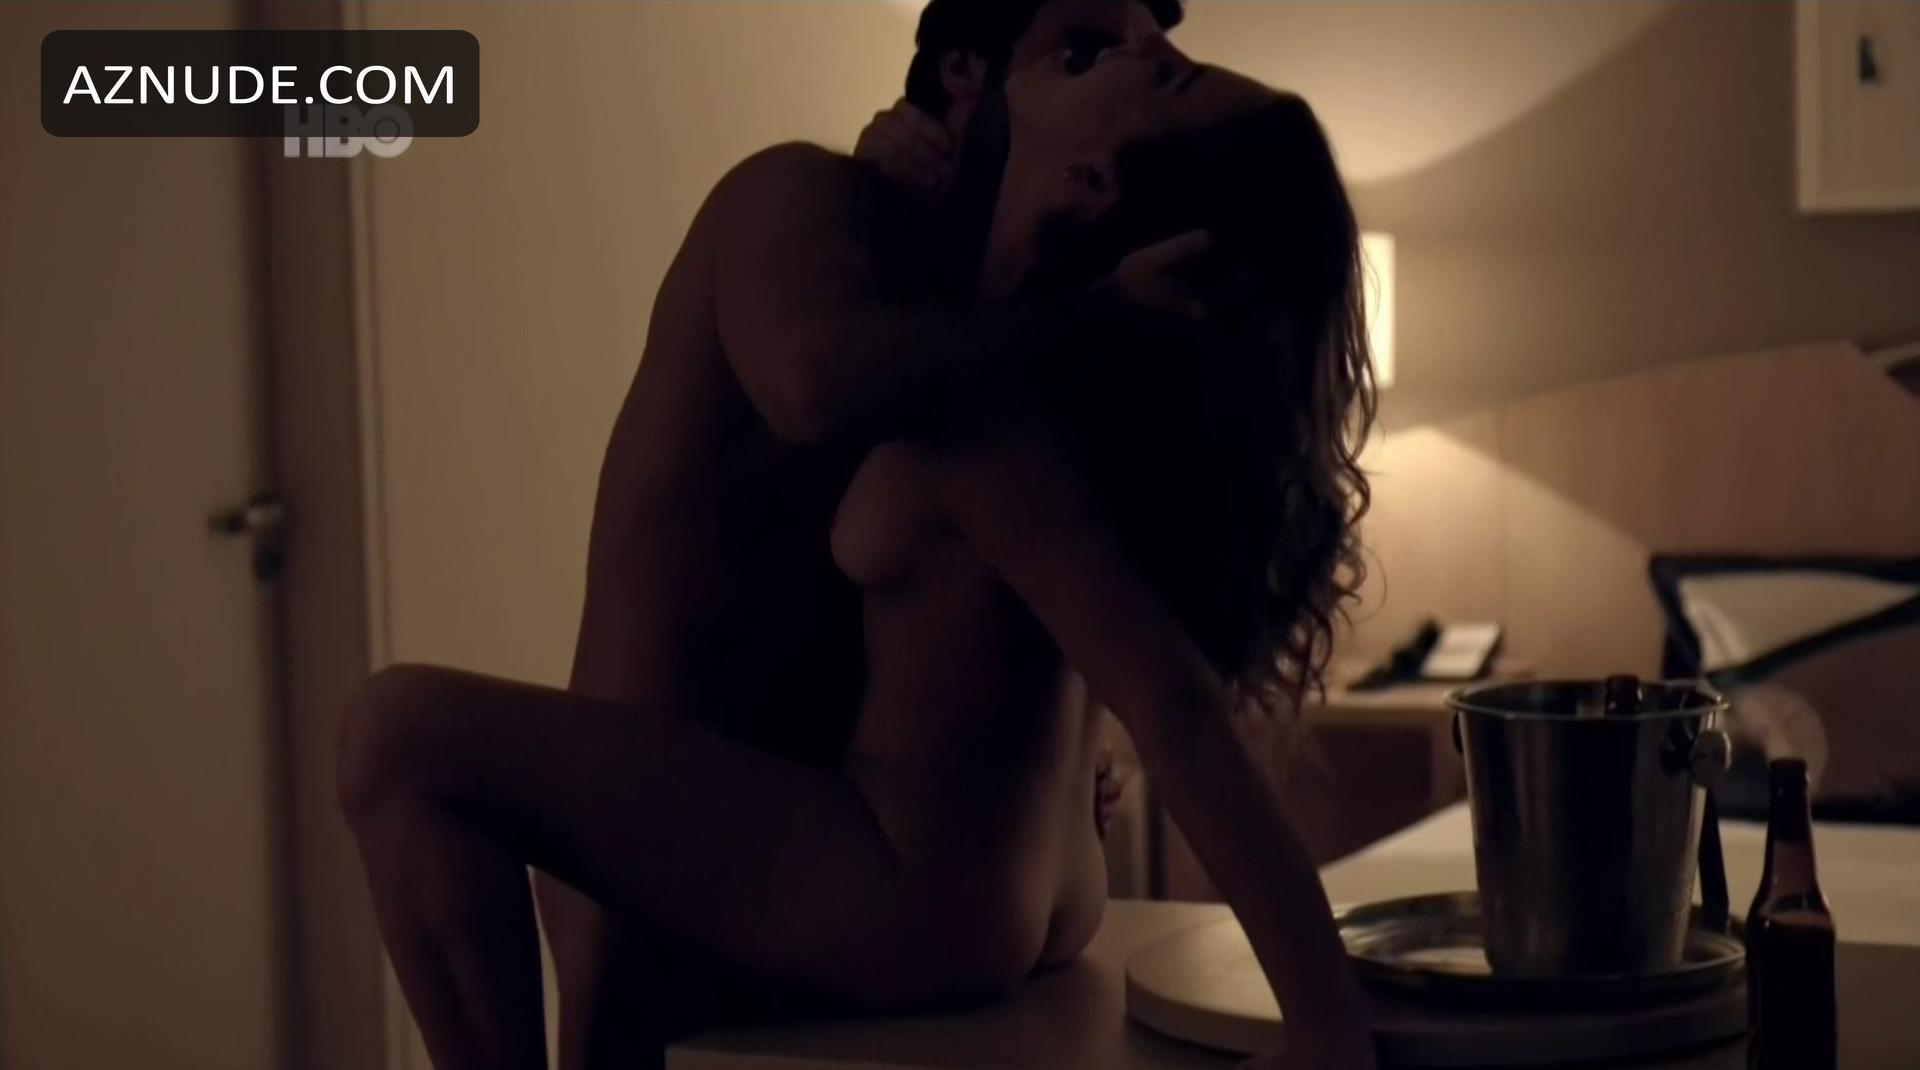 Jessica alba nude pics fake porn pictures